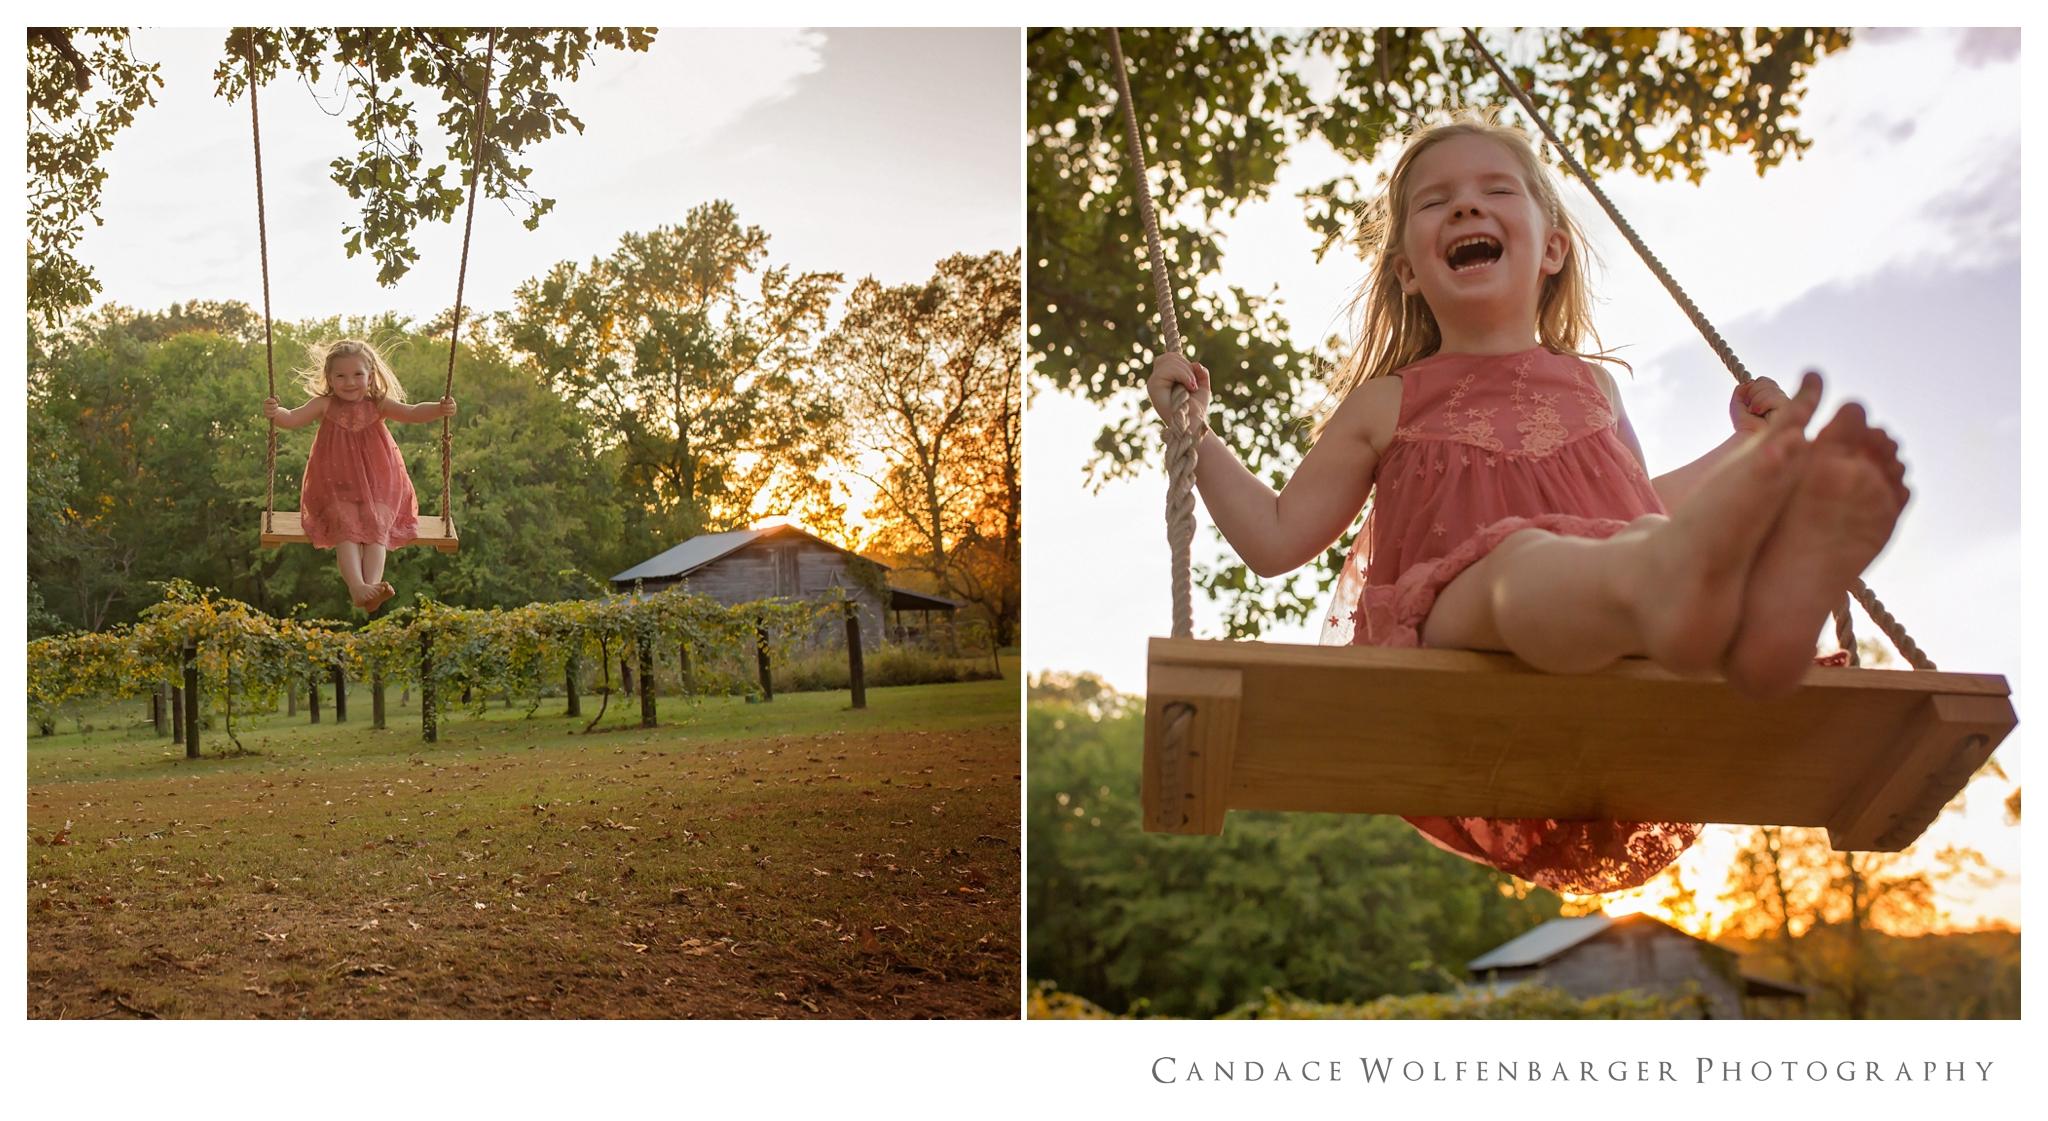 Naaman Caroline Swing Session Candace Wolfenbarger Sanford NC Childrens Photographer 12.jpg